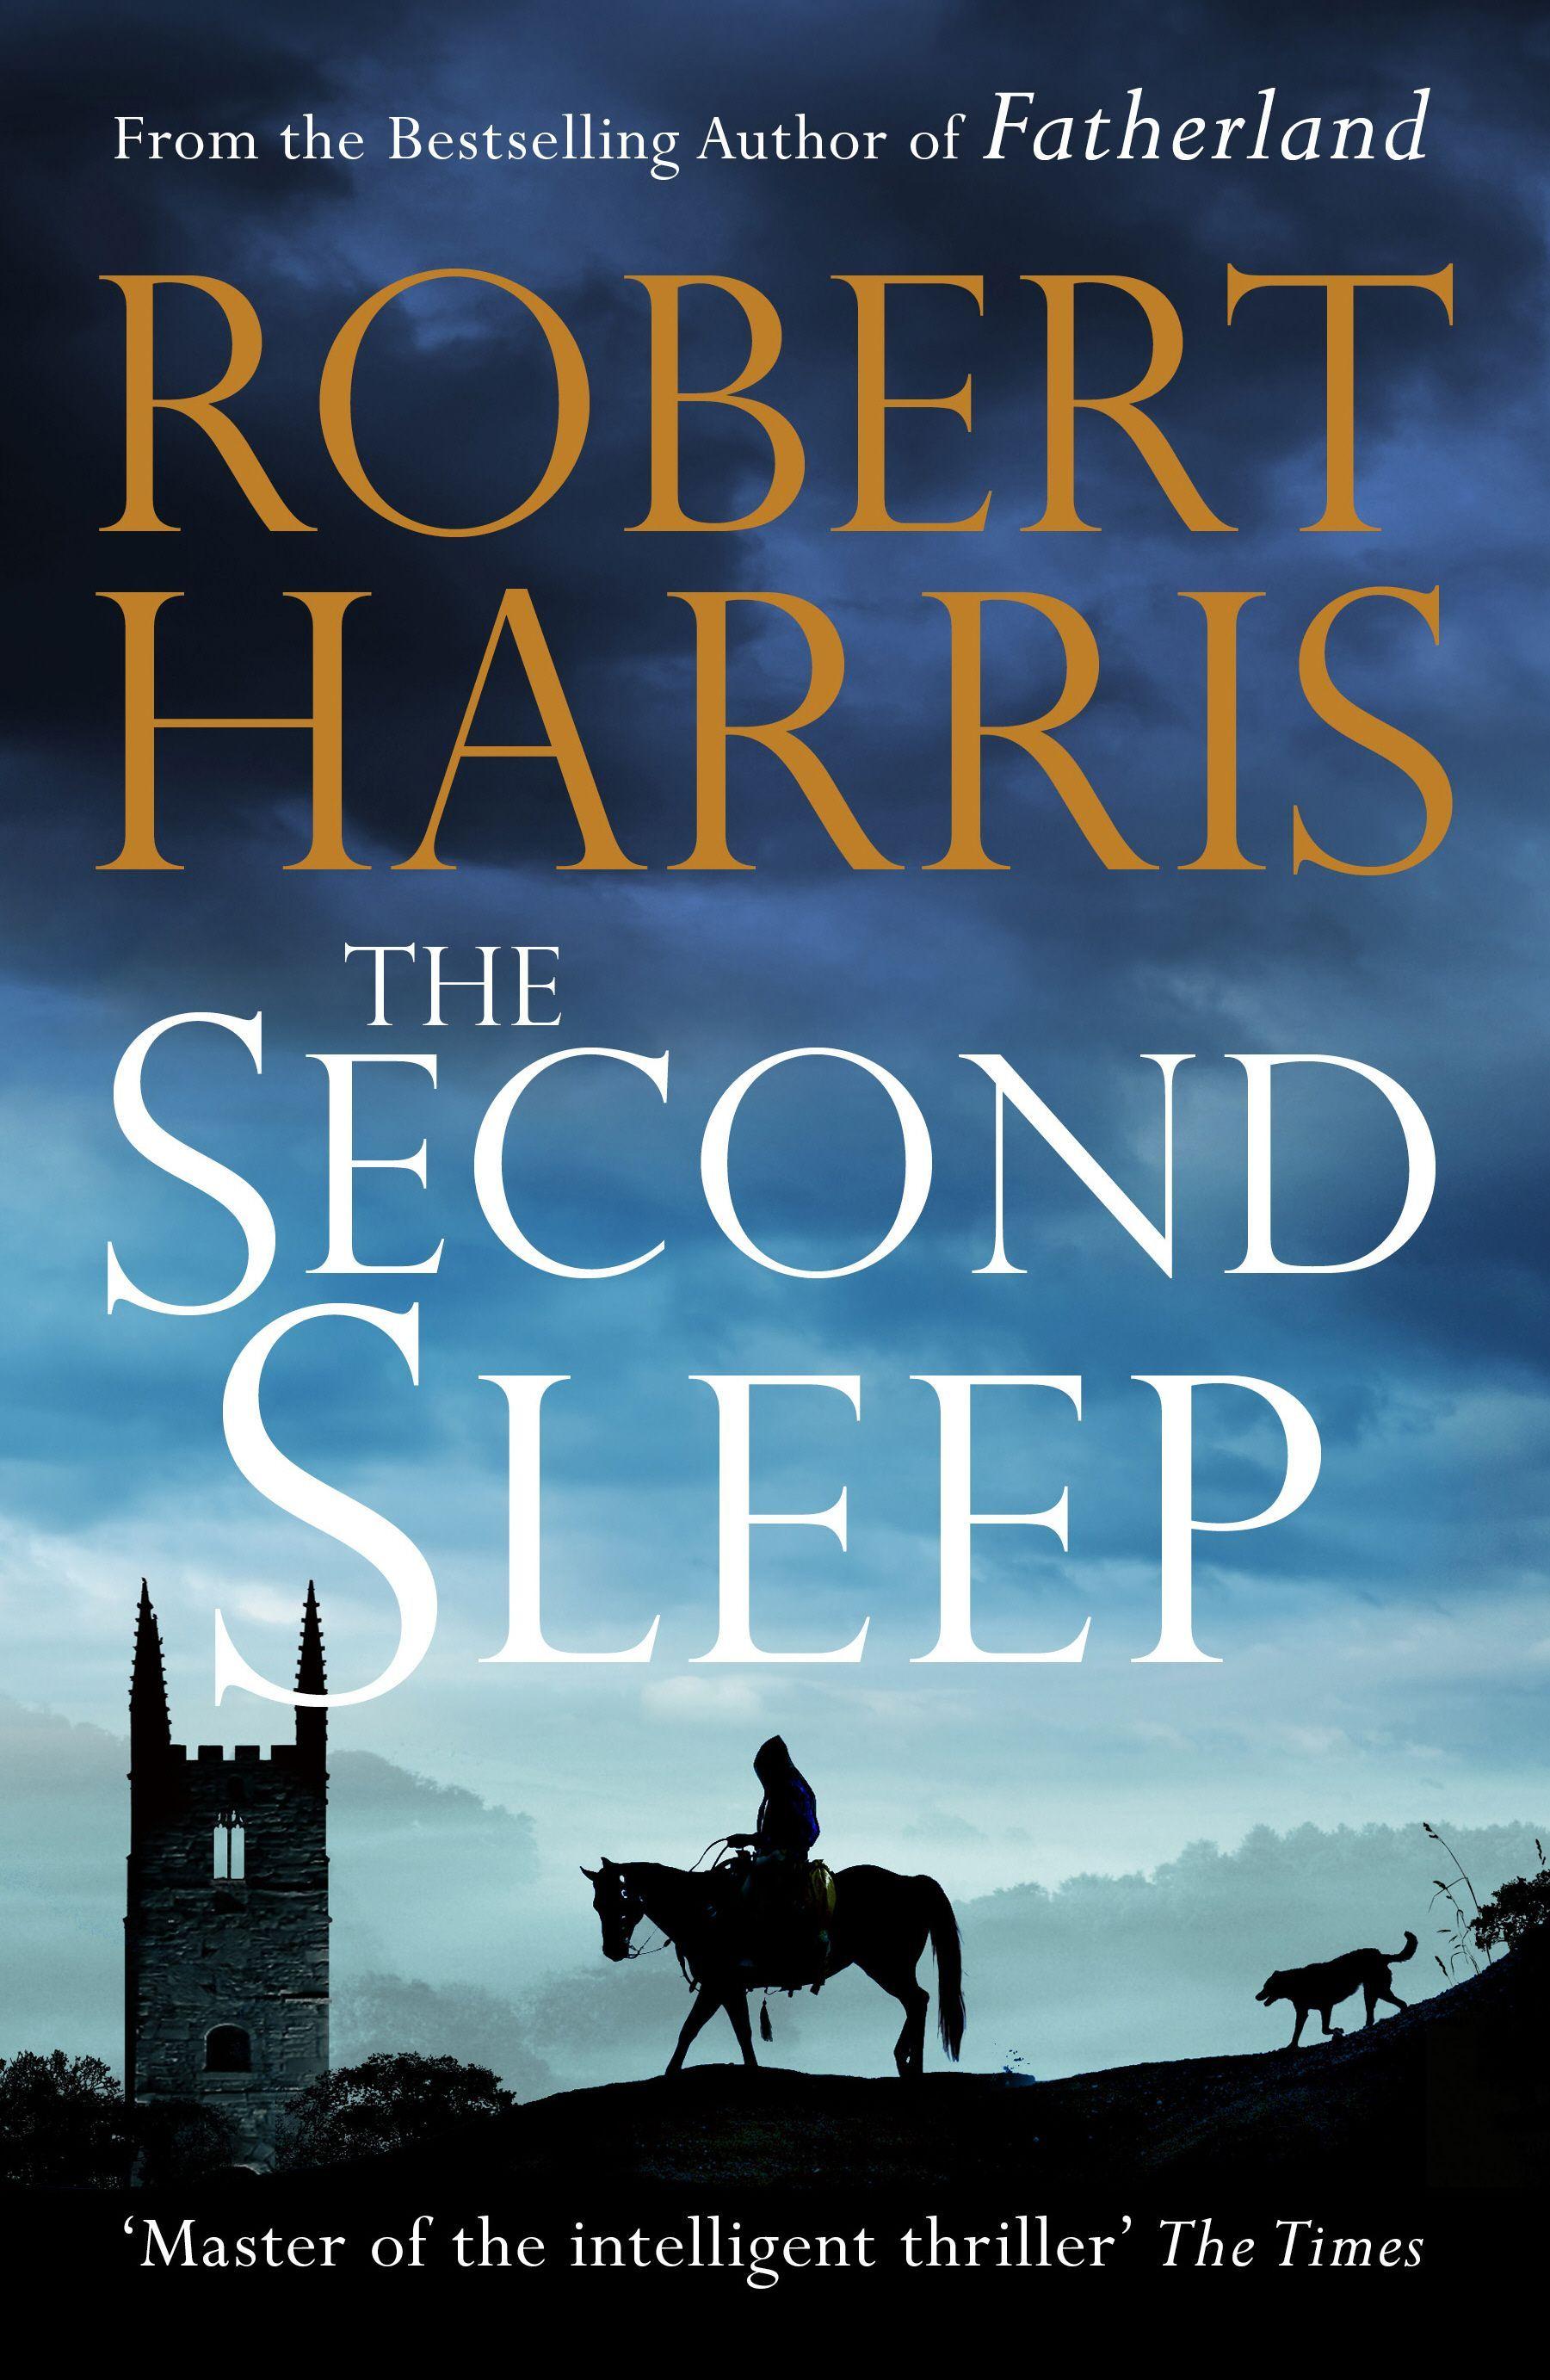 Pdf Free Download The Second Sleep By Robert Harris Robert Harris Books To Read Novels